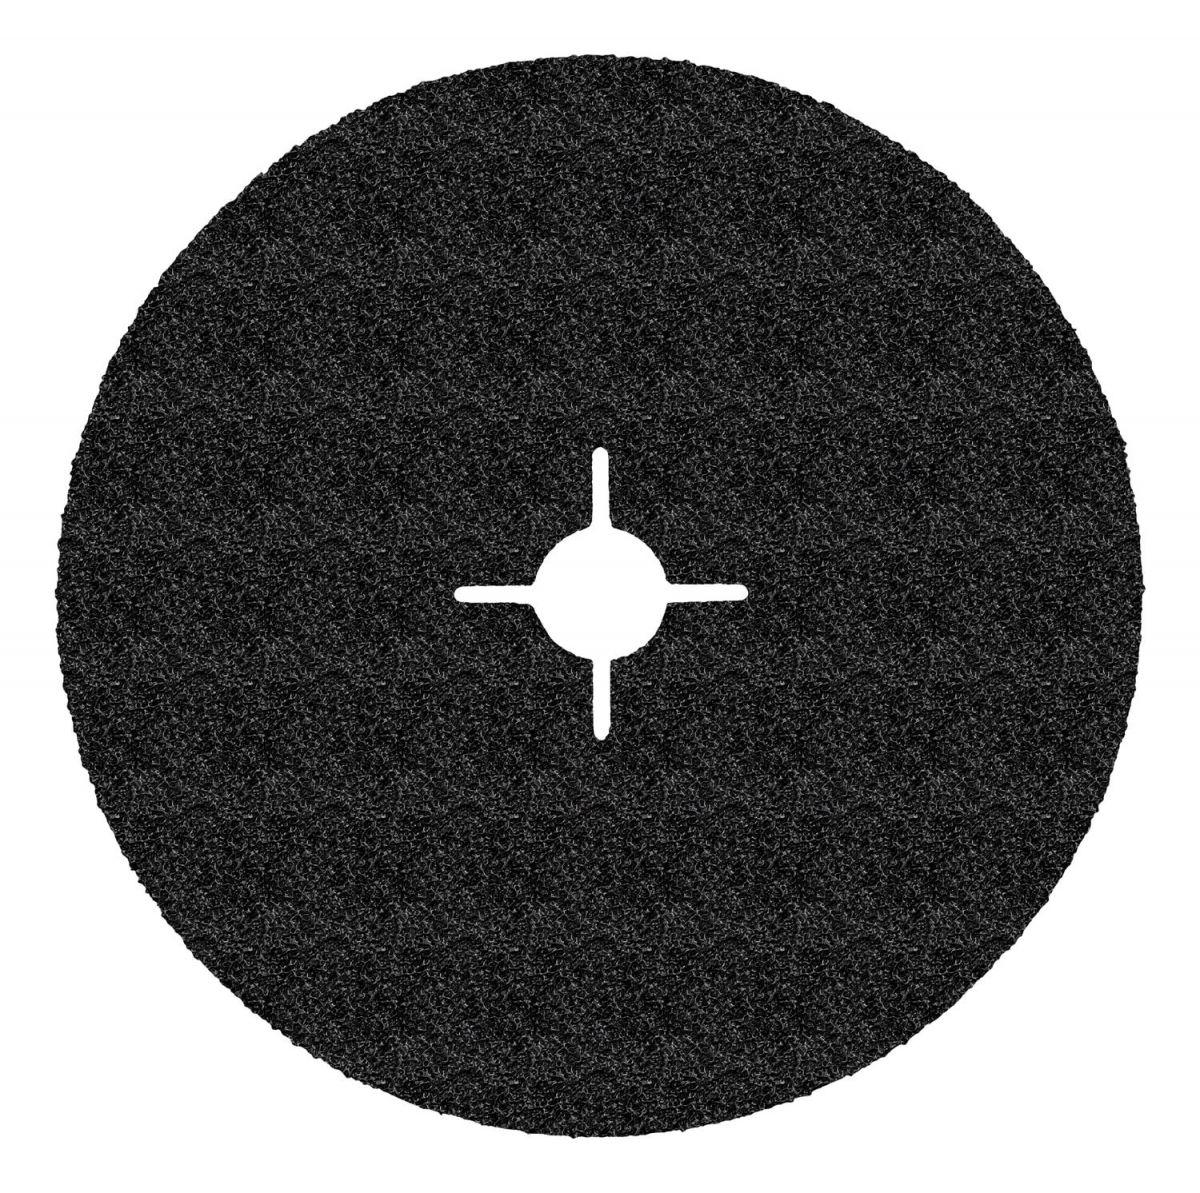 3m fibre schijf 501c 125 mm x 22 mm p60 slotted pn60513